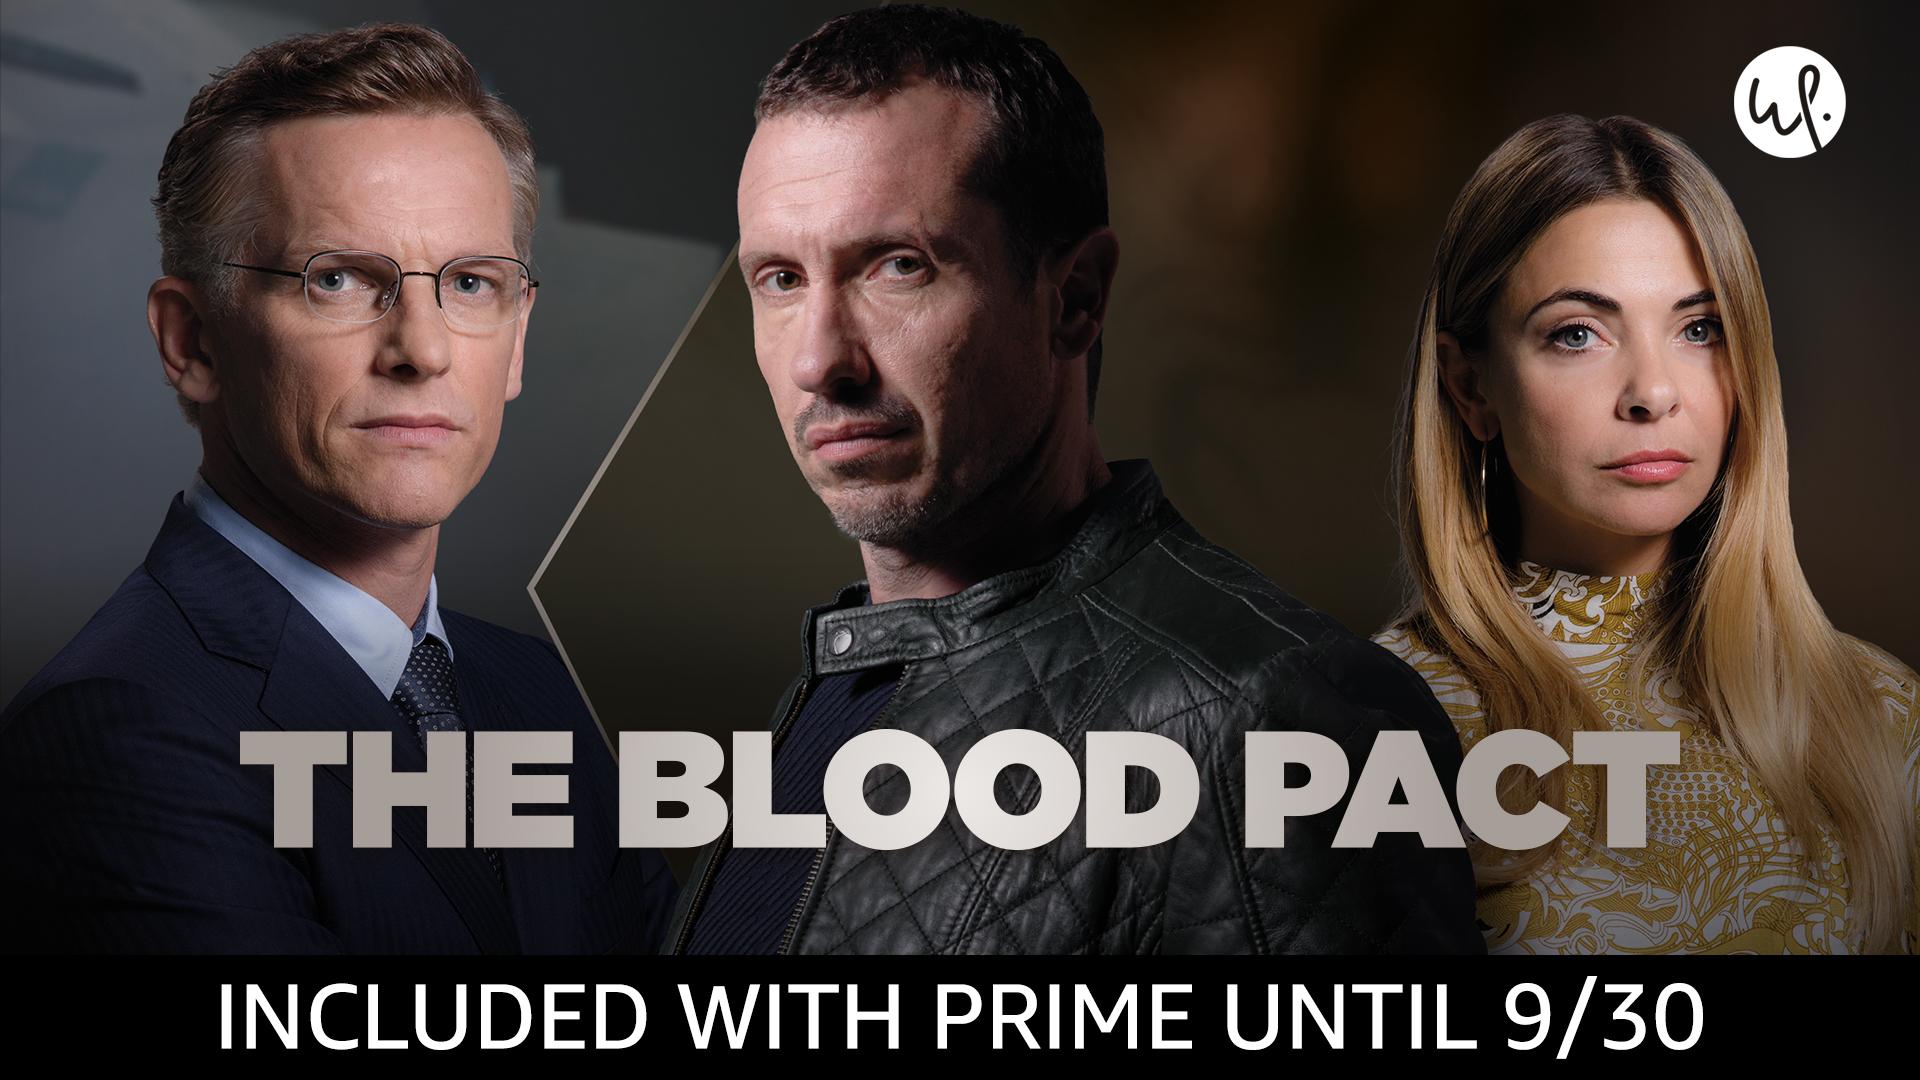 The Blood Pact: Season 1